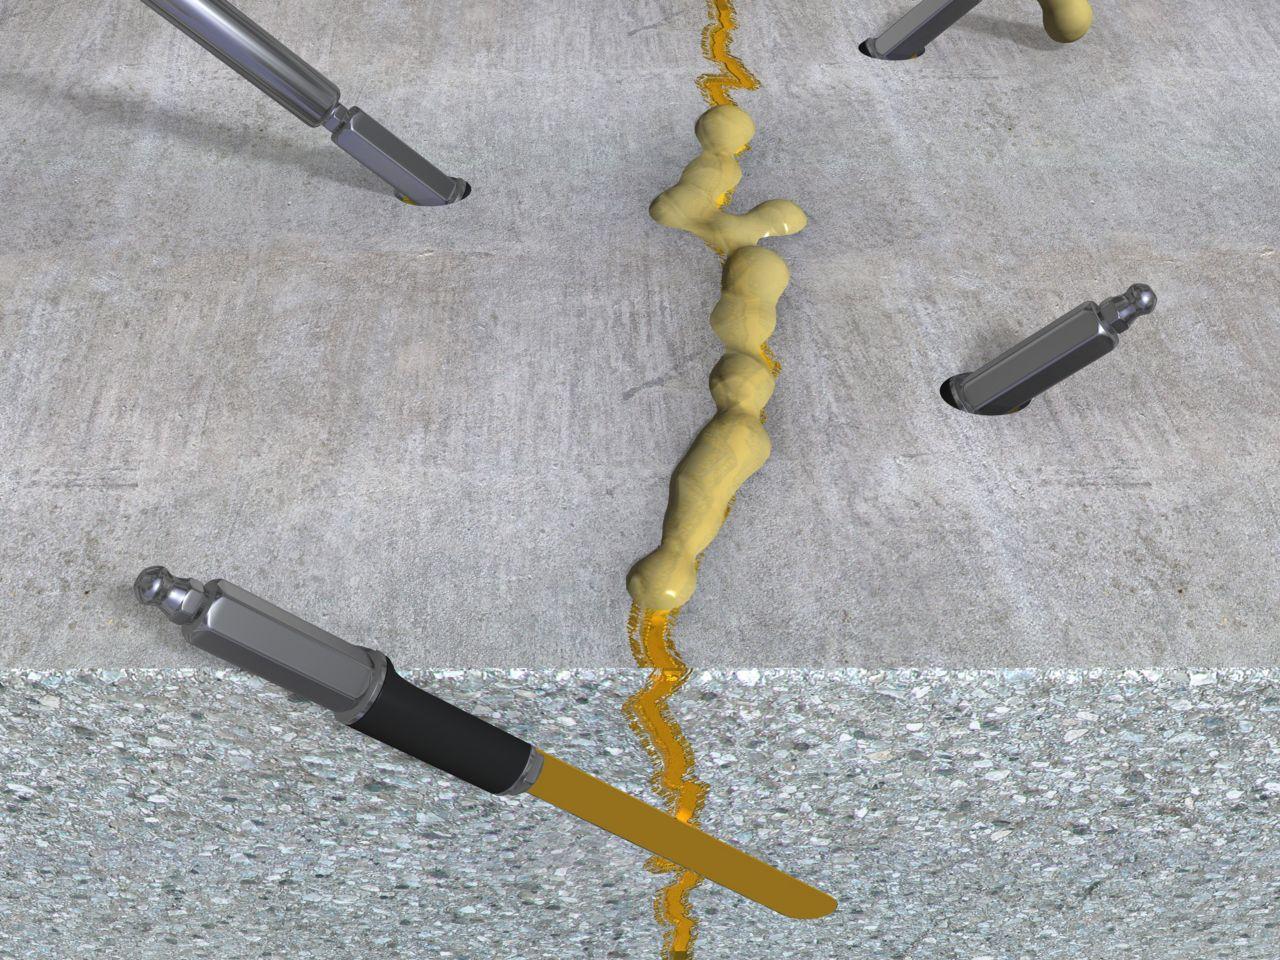 Injection for waterproofing leaking cracks 3d rendering